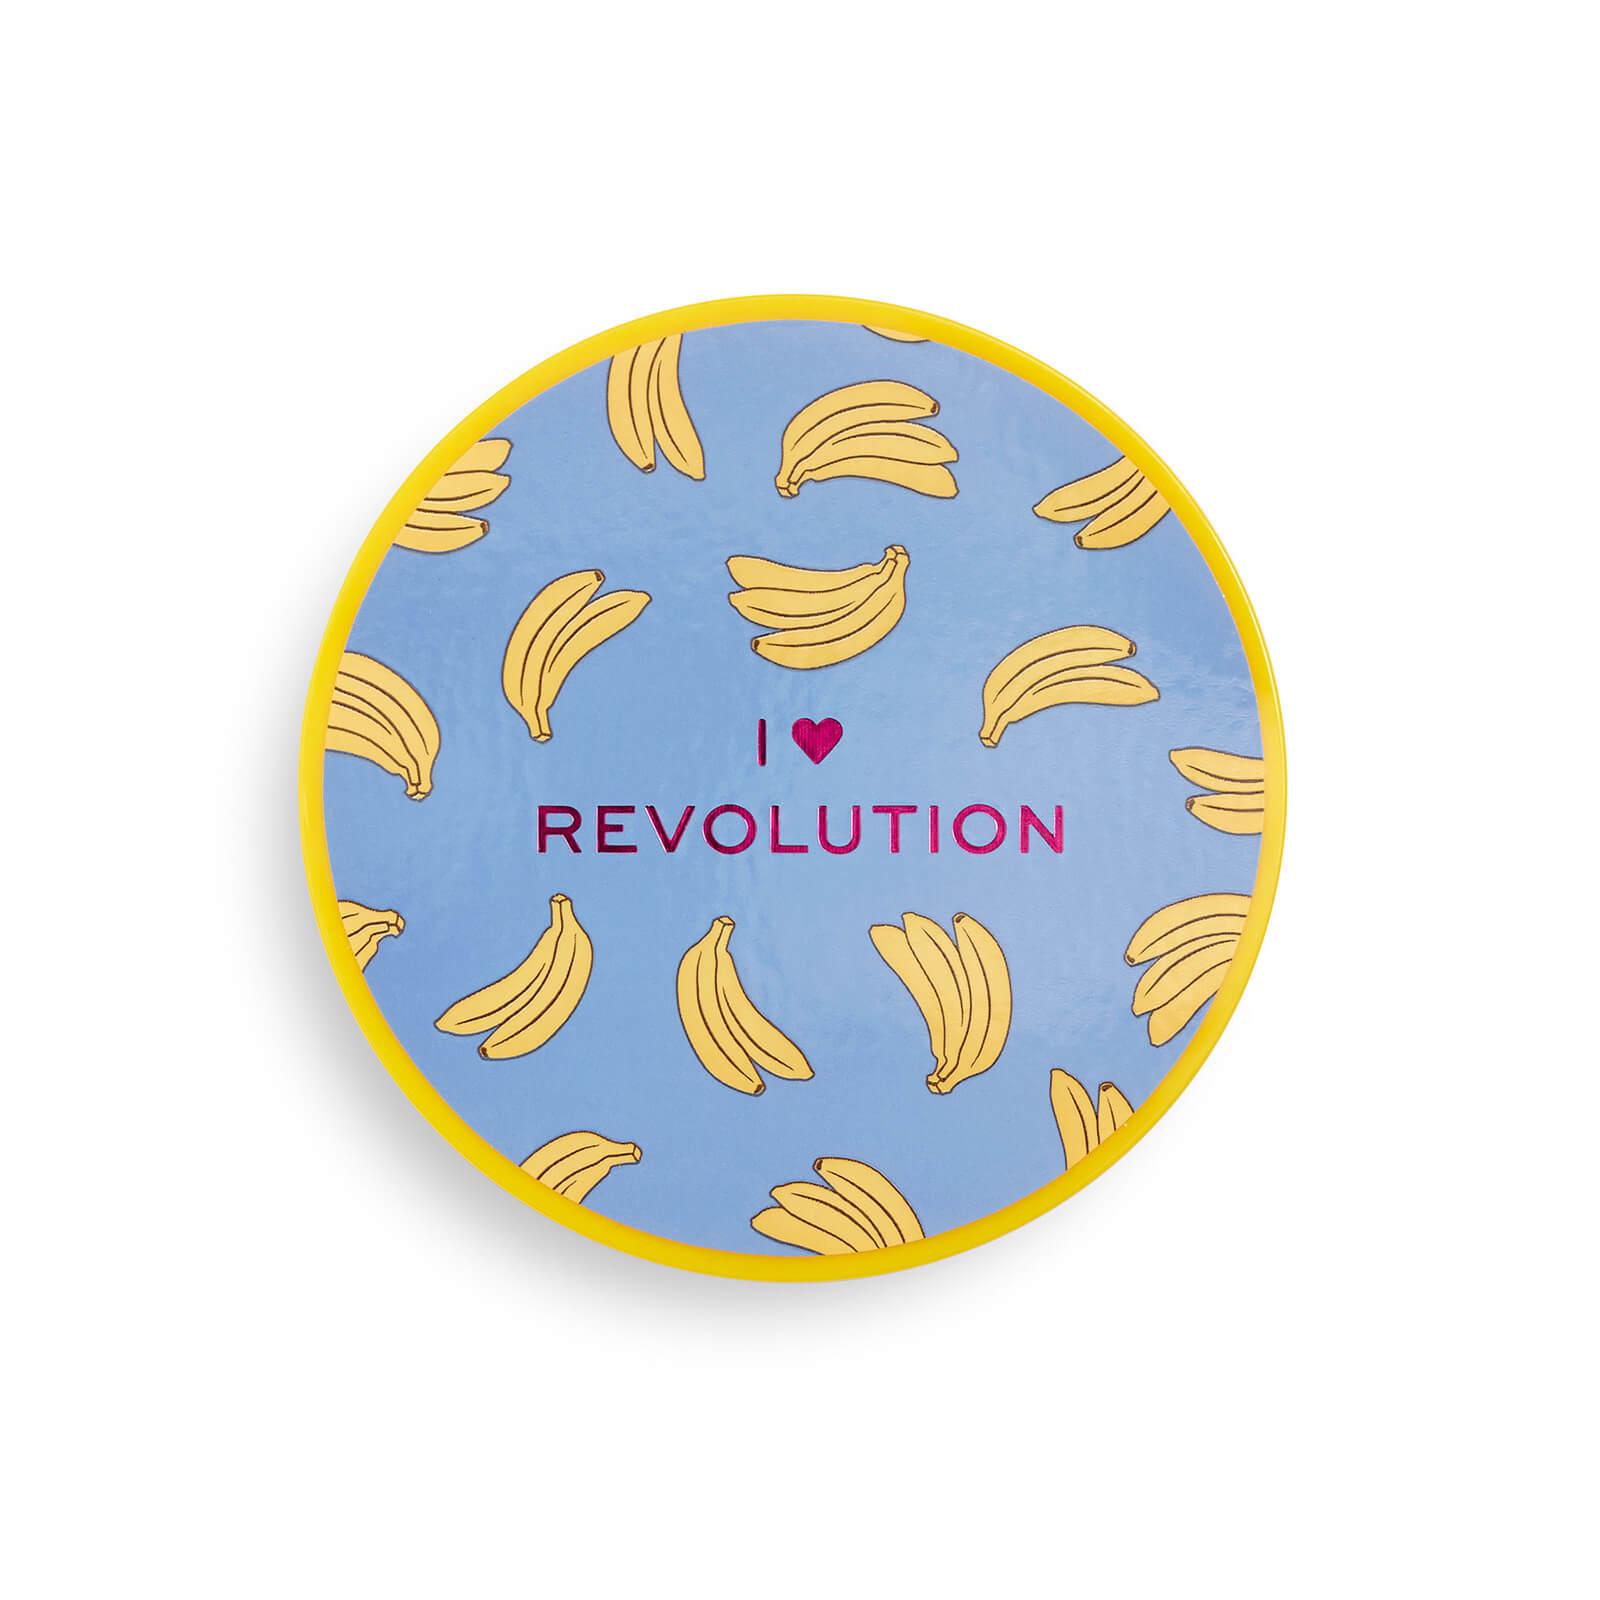 Revolution I Heart Revolution Loose Baking Powder (Various Shades) - Banana